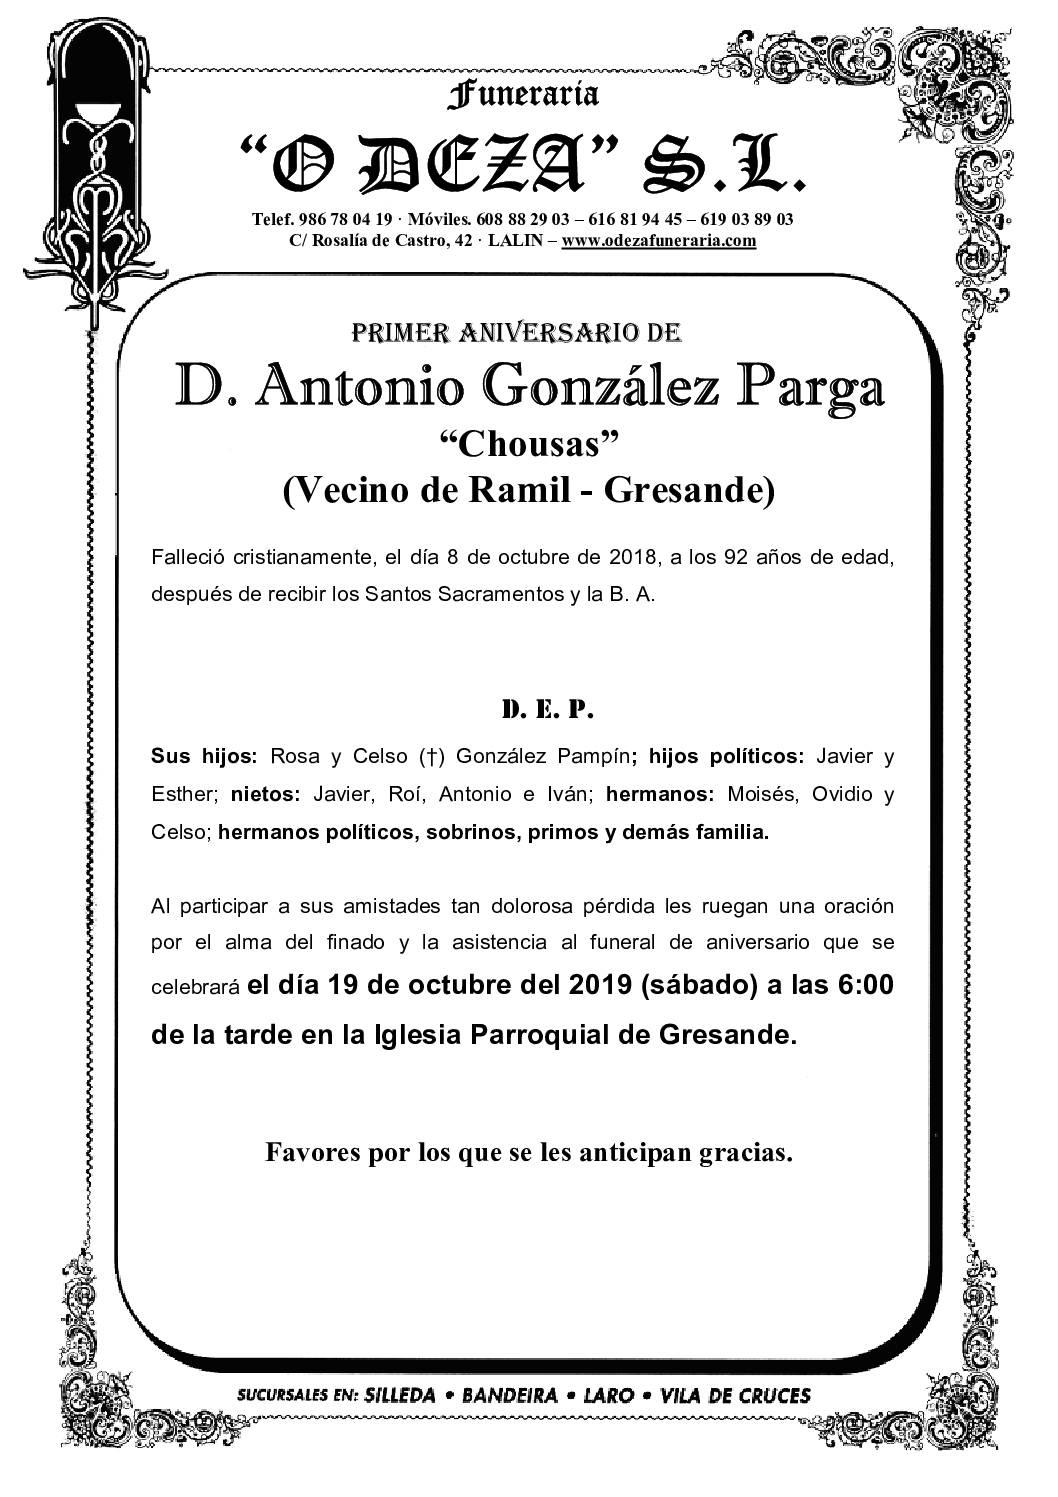 D. ANTONIO GONZÁLEZ PARGA